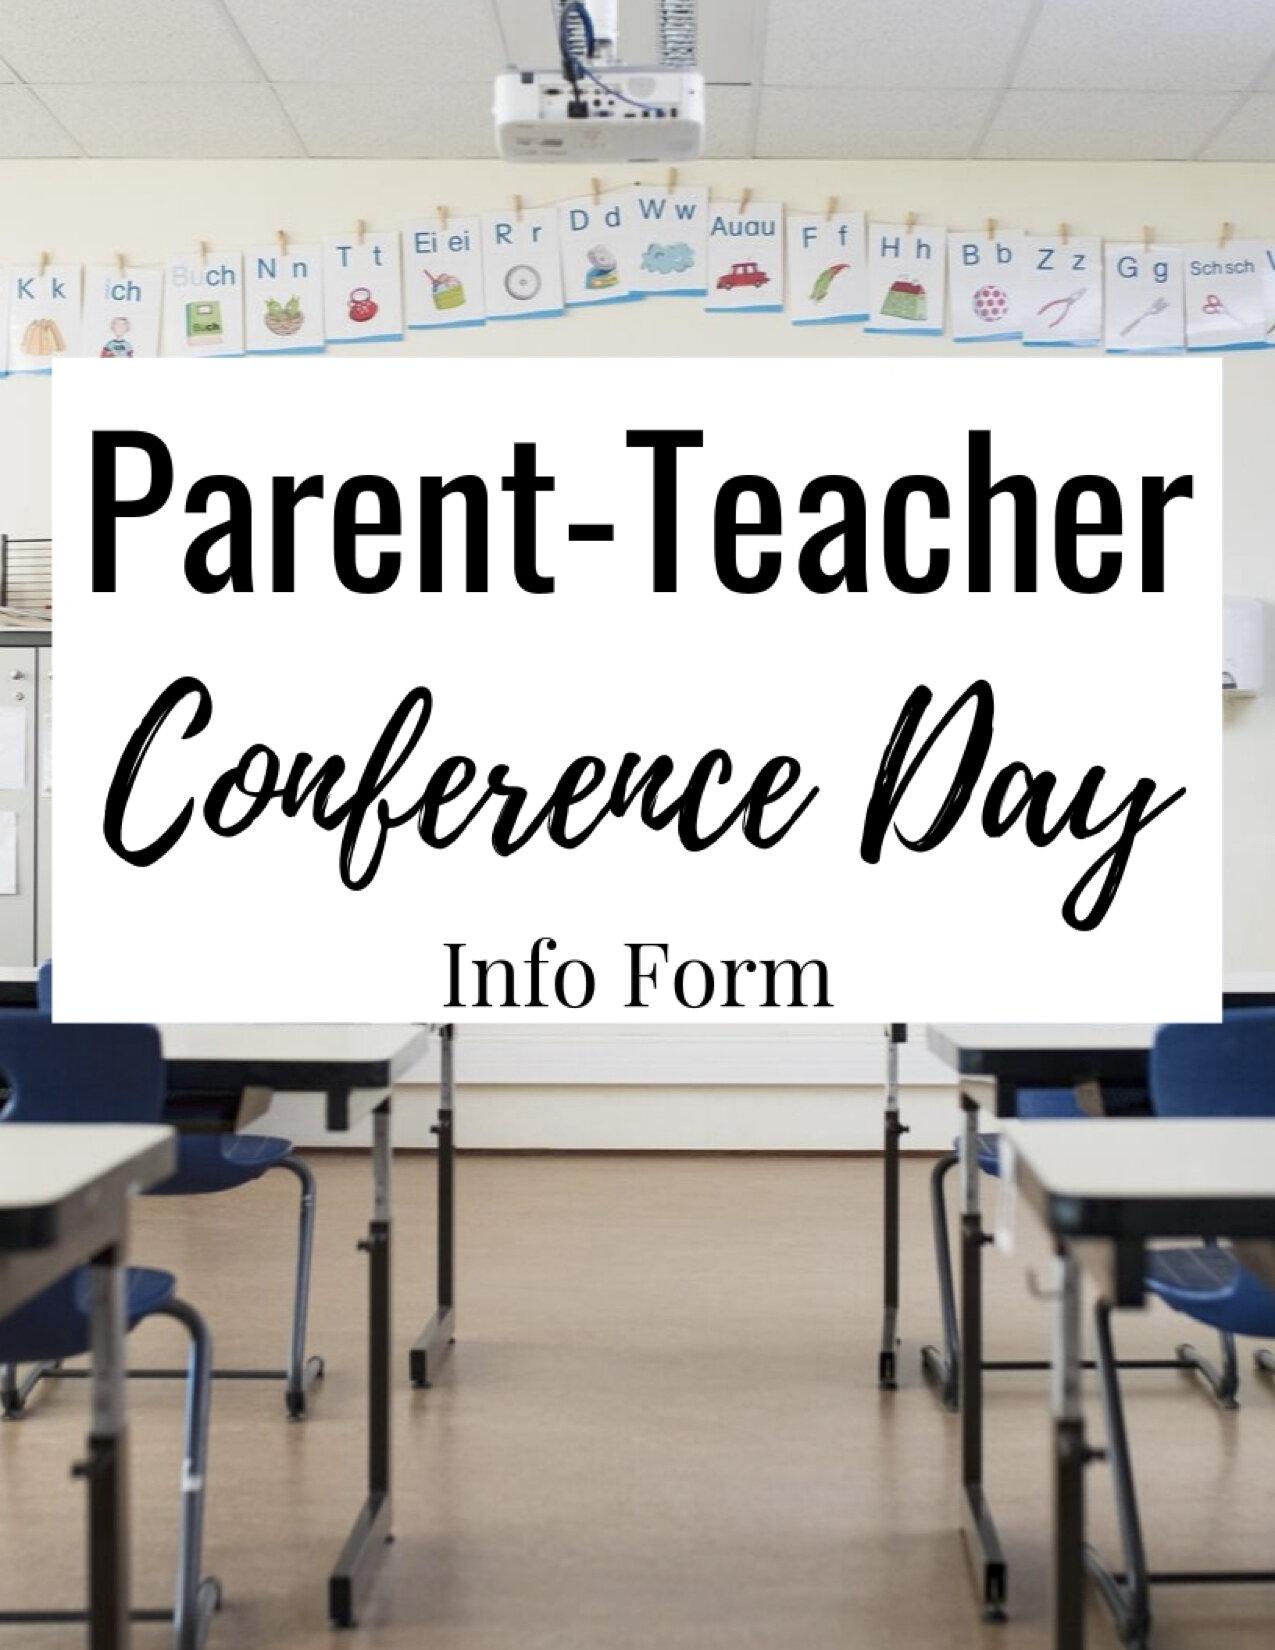 Parent-Teacher Conference Day Handout by Bespoke ELA1.jpg